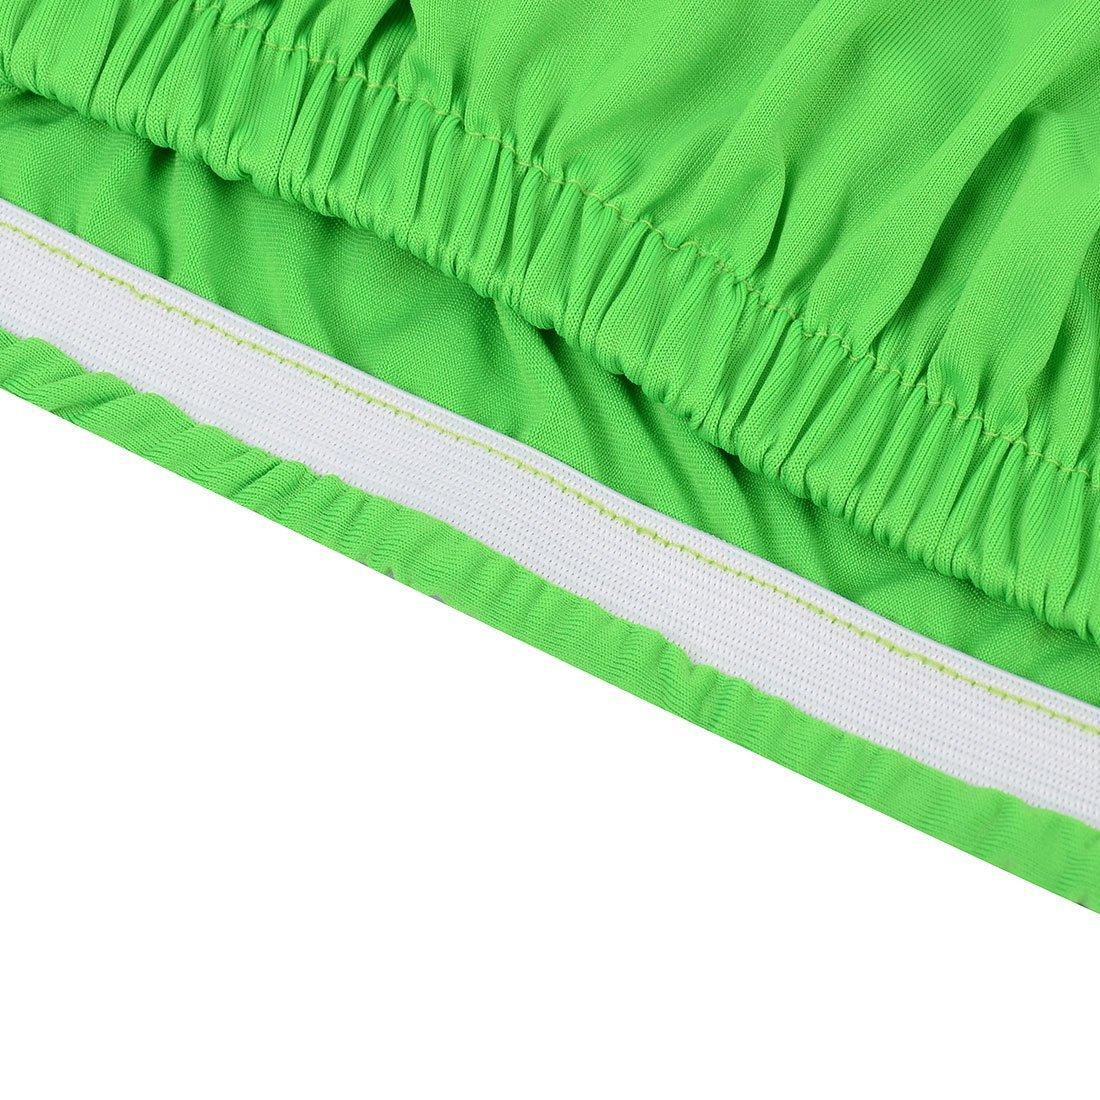 Amazon.com: Spandex Festa Casamento Casa DealMux Elastic reutilizável lavável Chair Seat Cover Protector Verde: Home & Kitchen